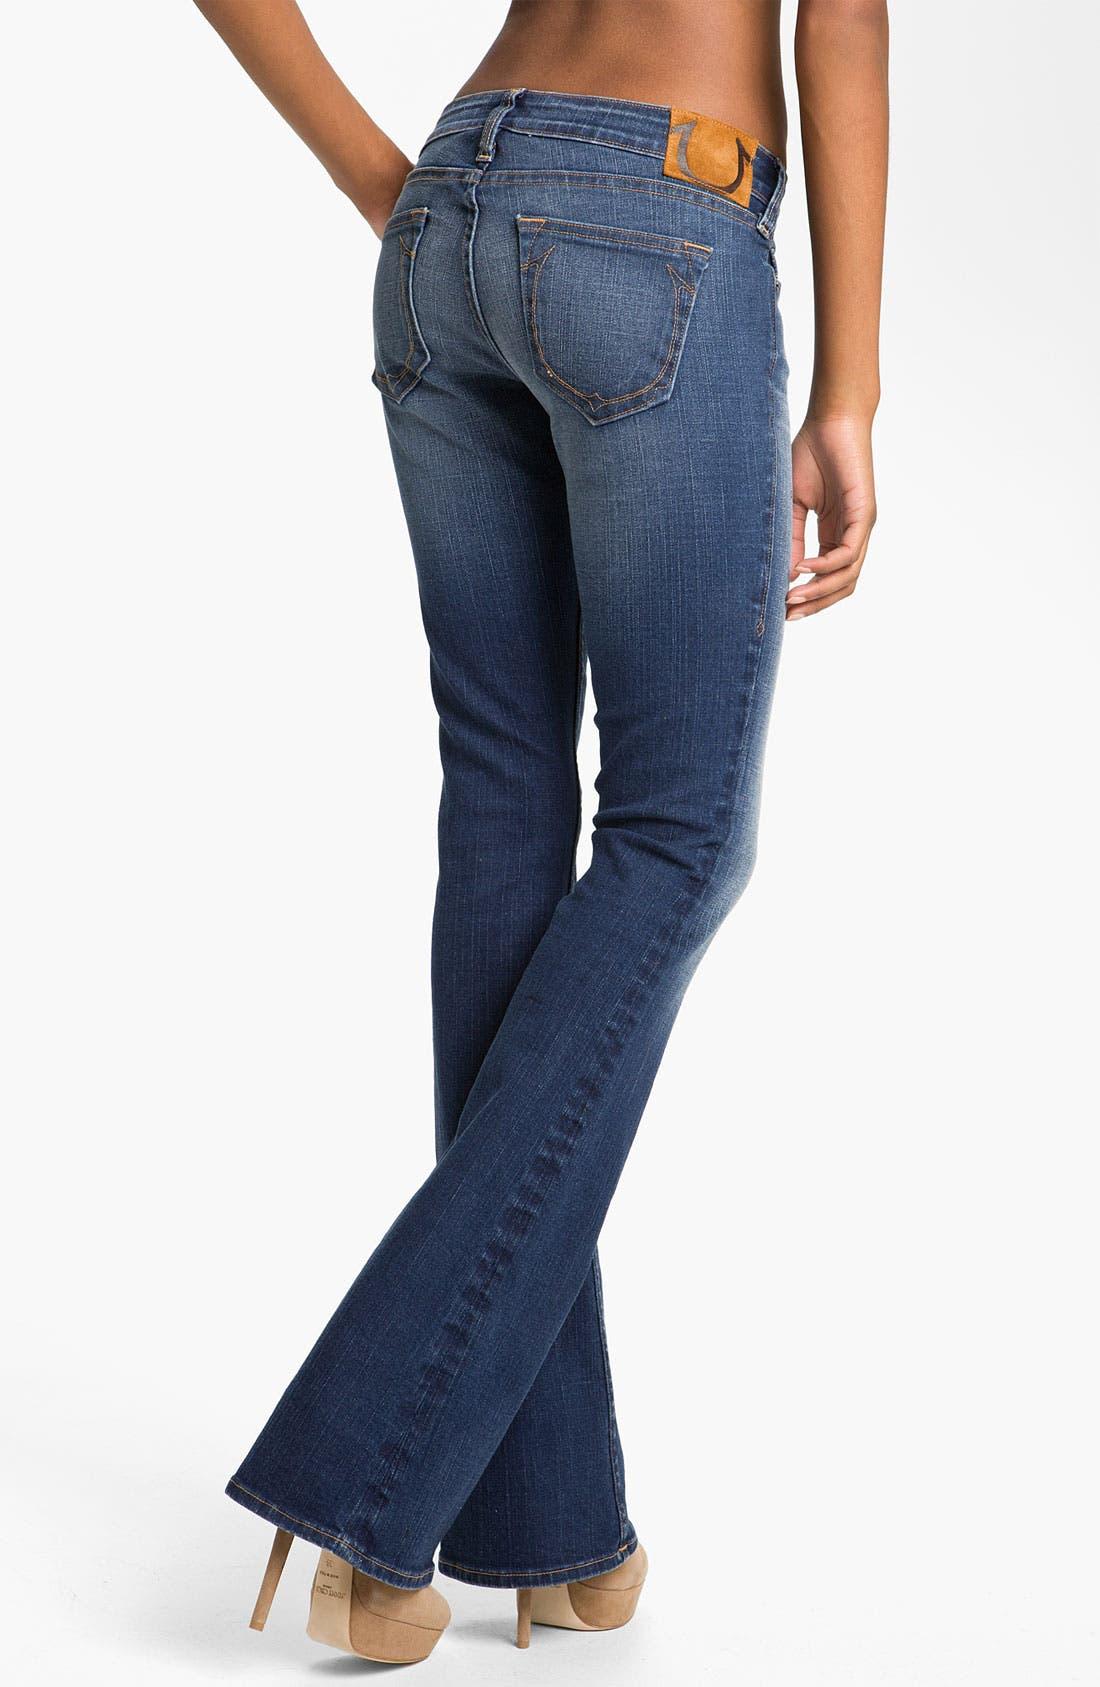 Alternate Image 2  - True Religion Brand Jeans 'Bobby' Bootcut Jeans (Del Mar Medium)